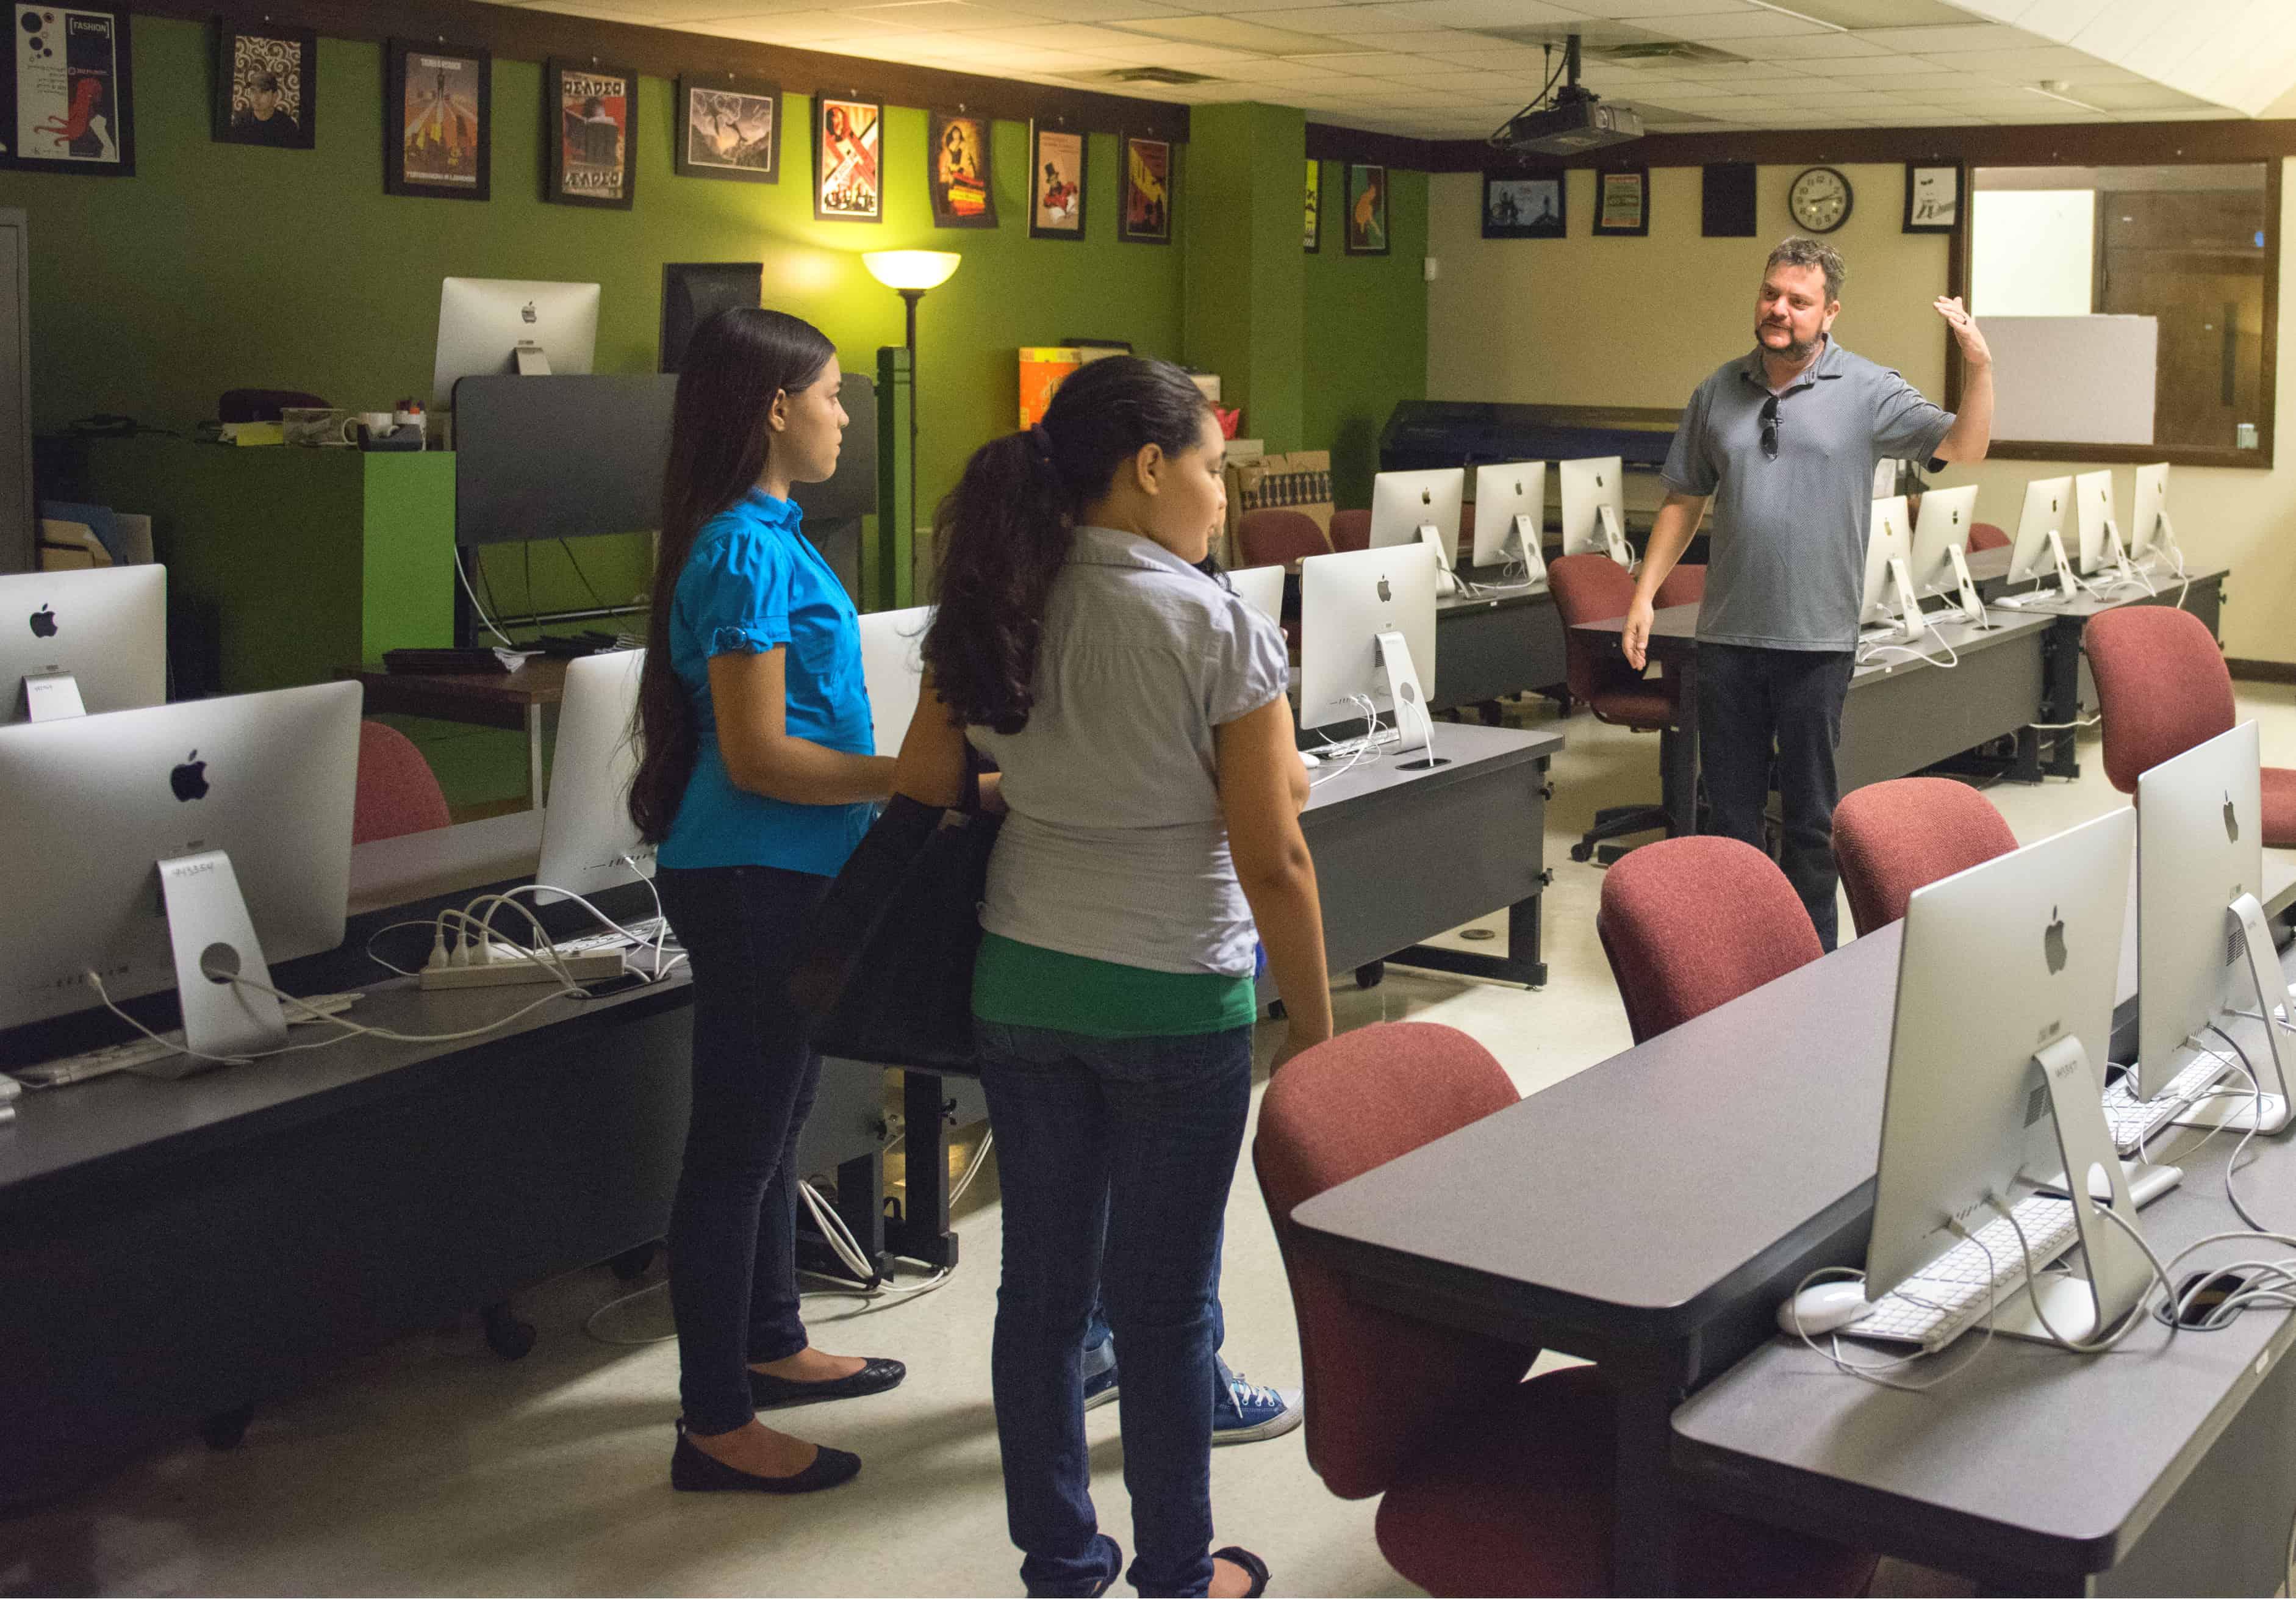 Dallas Community Colleges - Eastfield Campus Influencer Tour - Digital Media Department